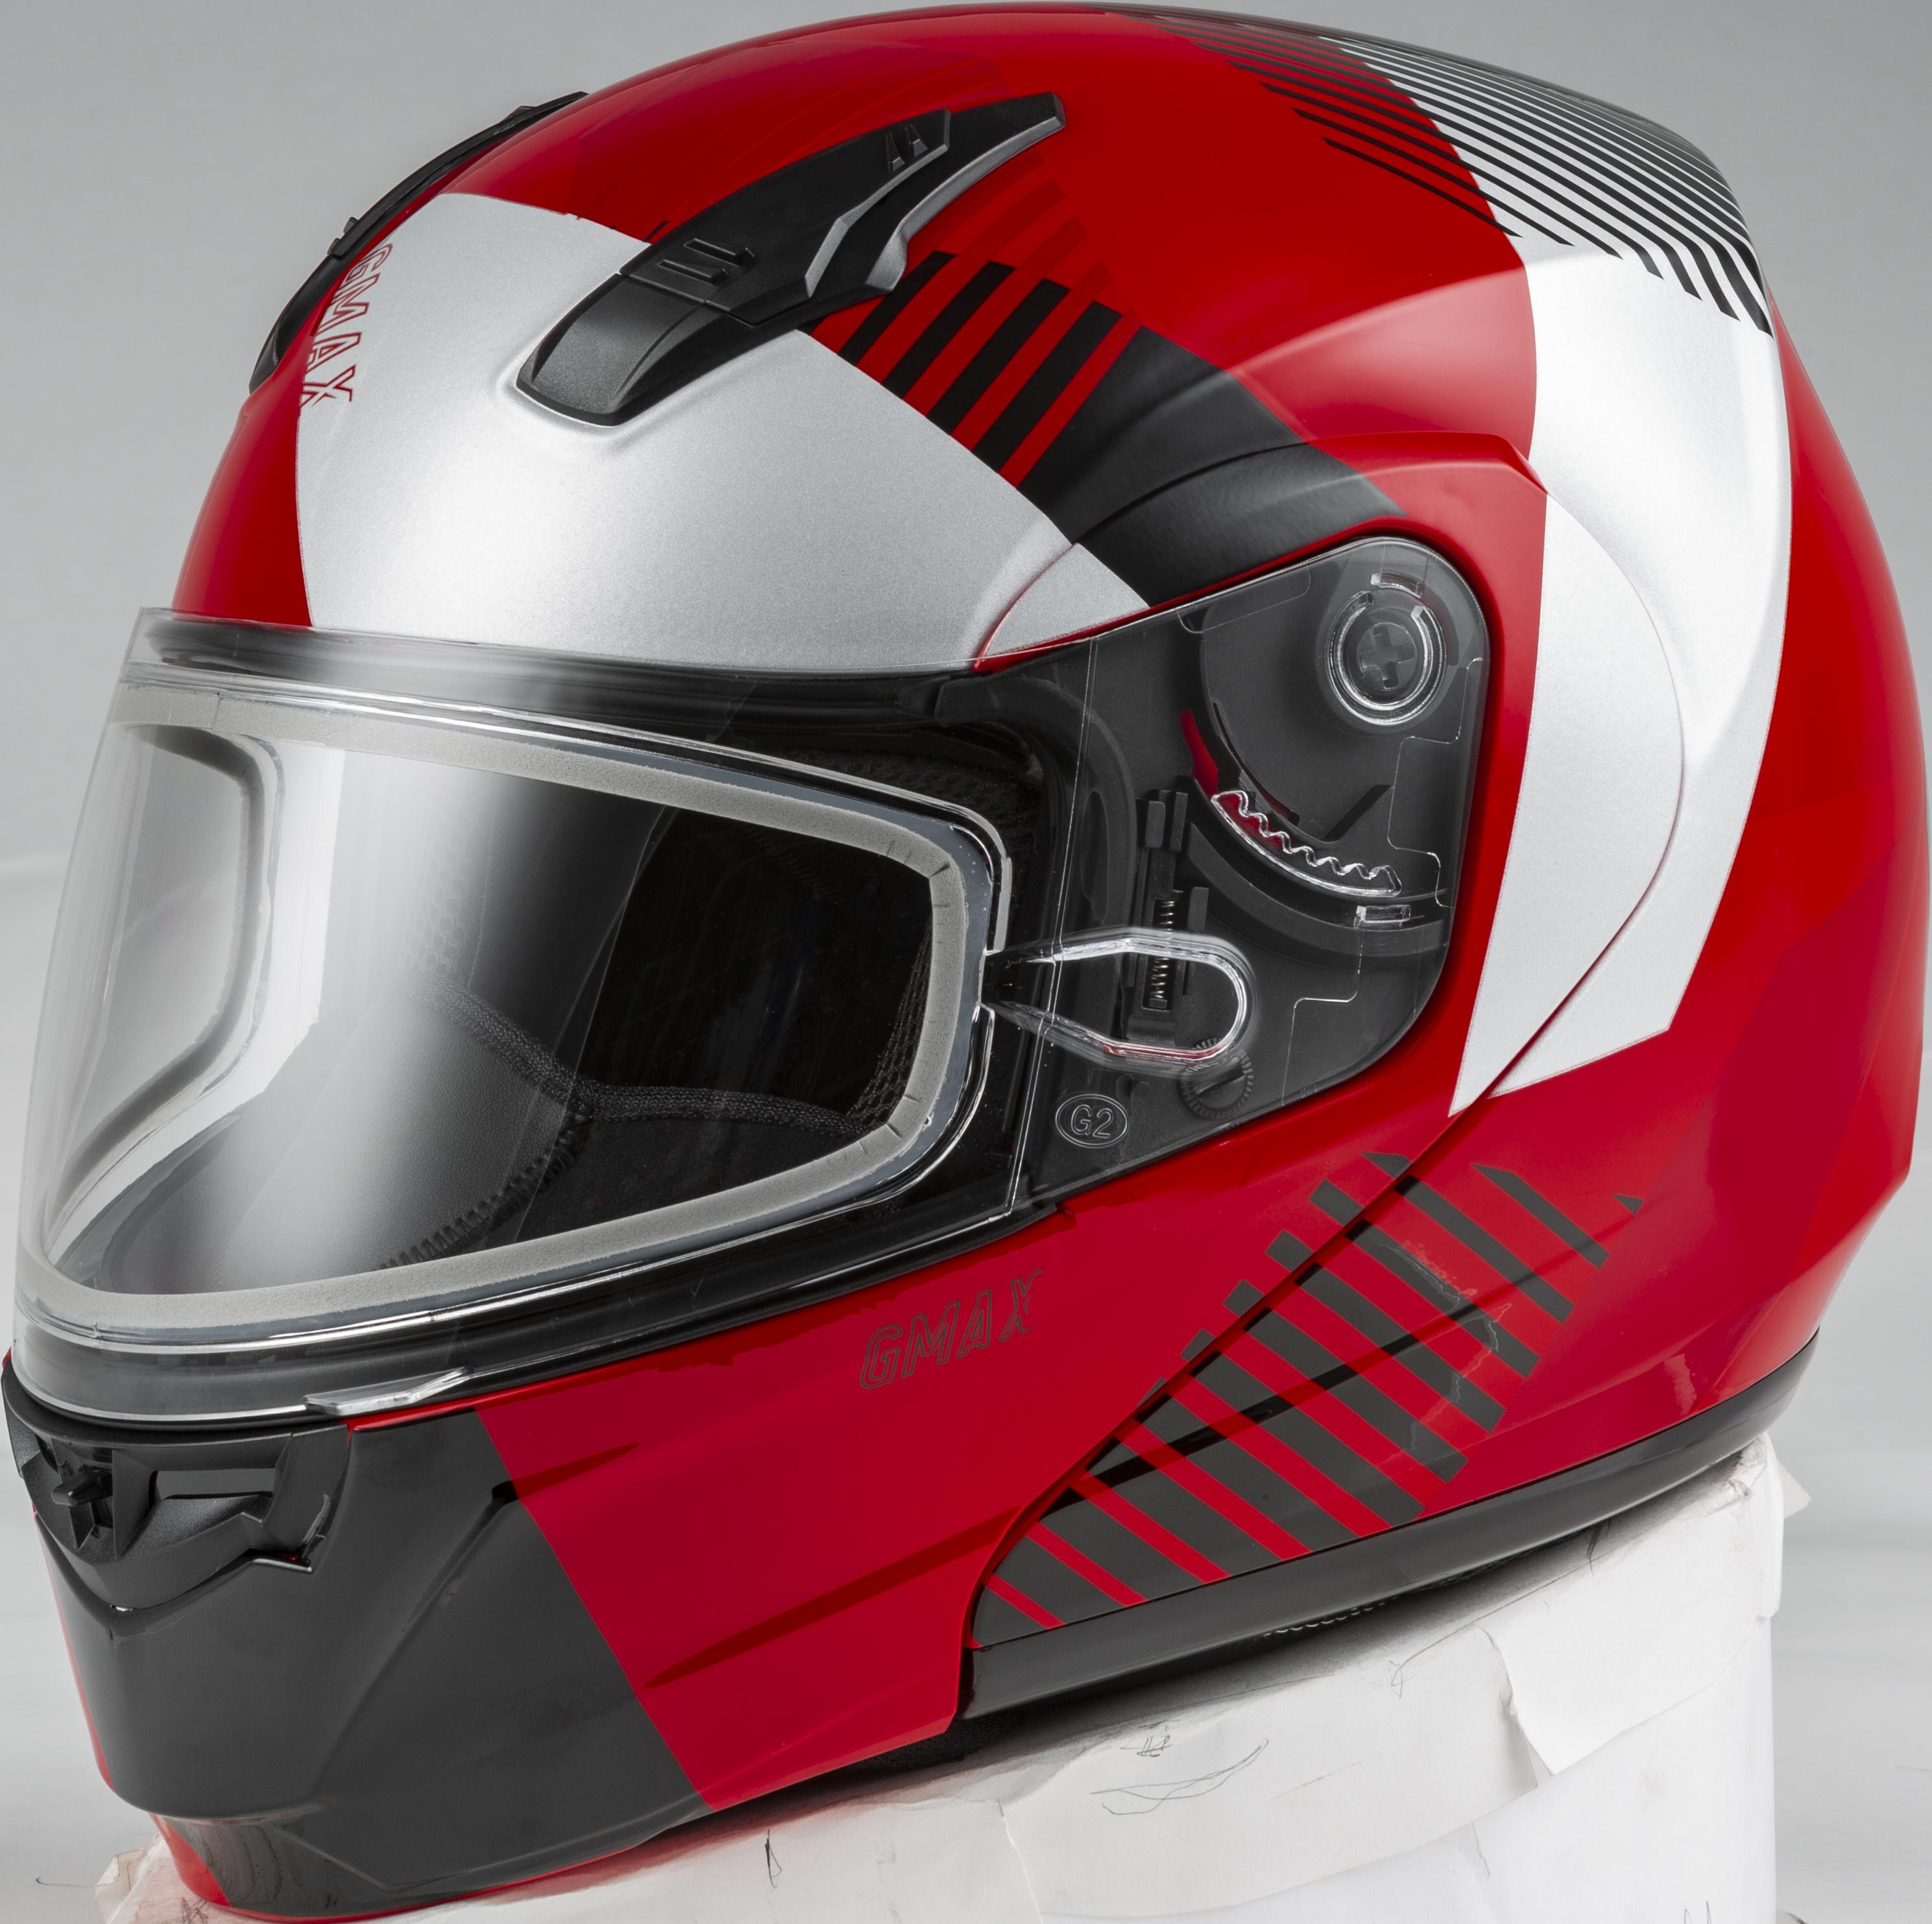 MD-04S Snow Helmet Reserve